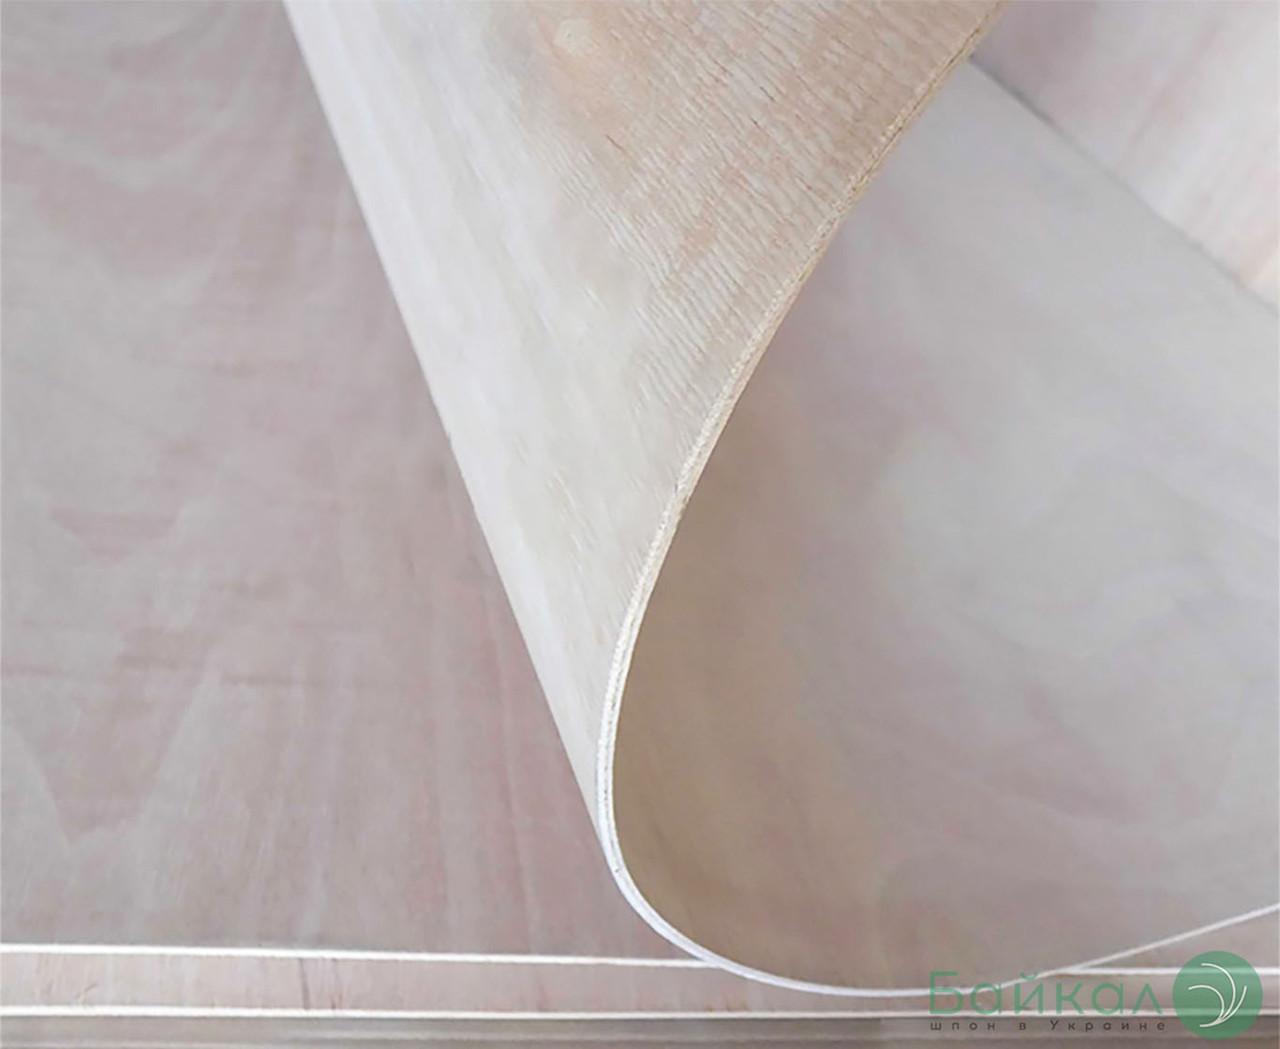 ФАНЕРА ГИБКАЯ сейба 3 мм - 1,22х2,44 м (Поперечная / CROSS)